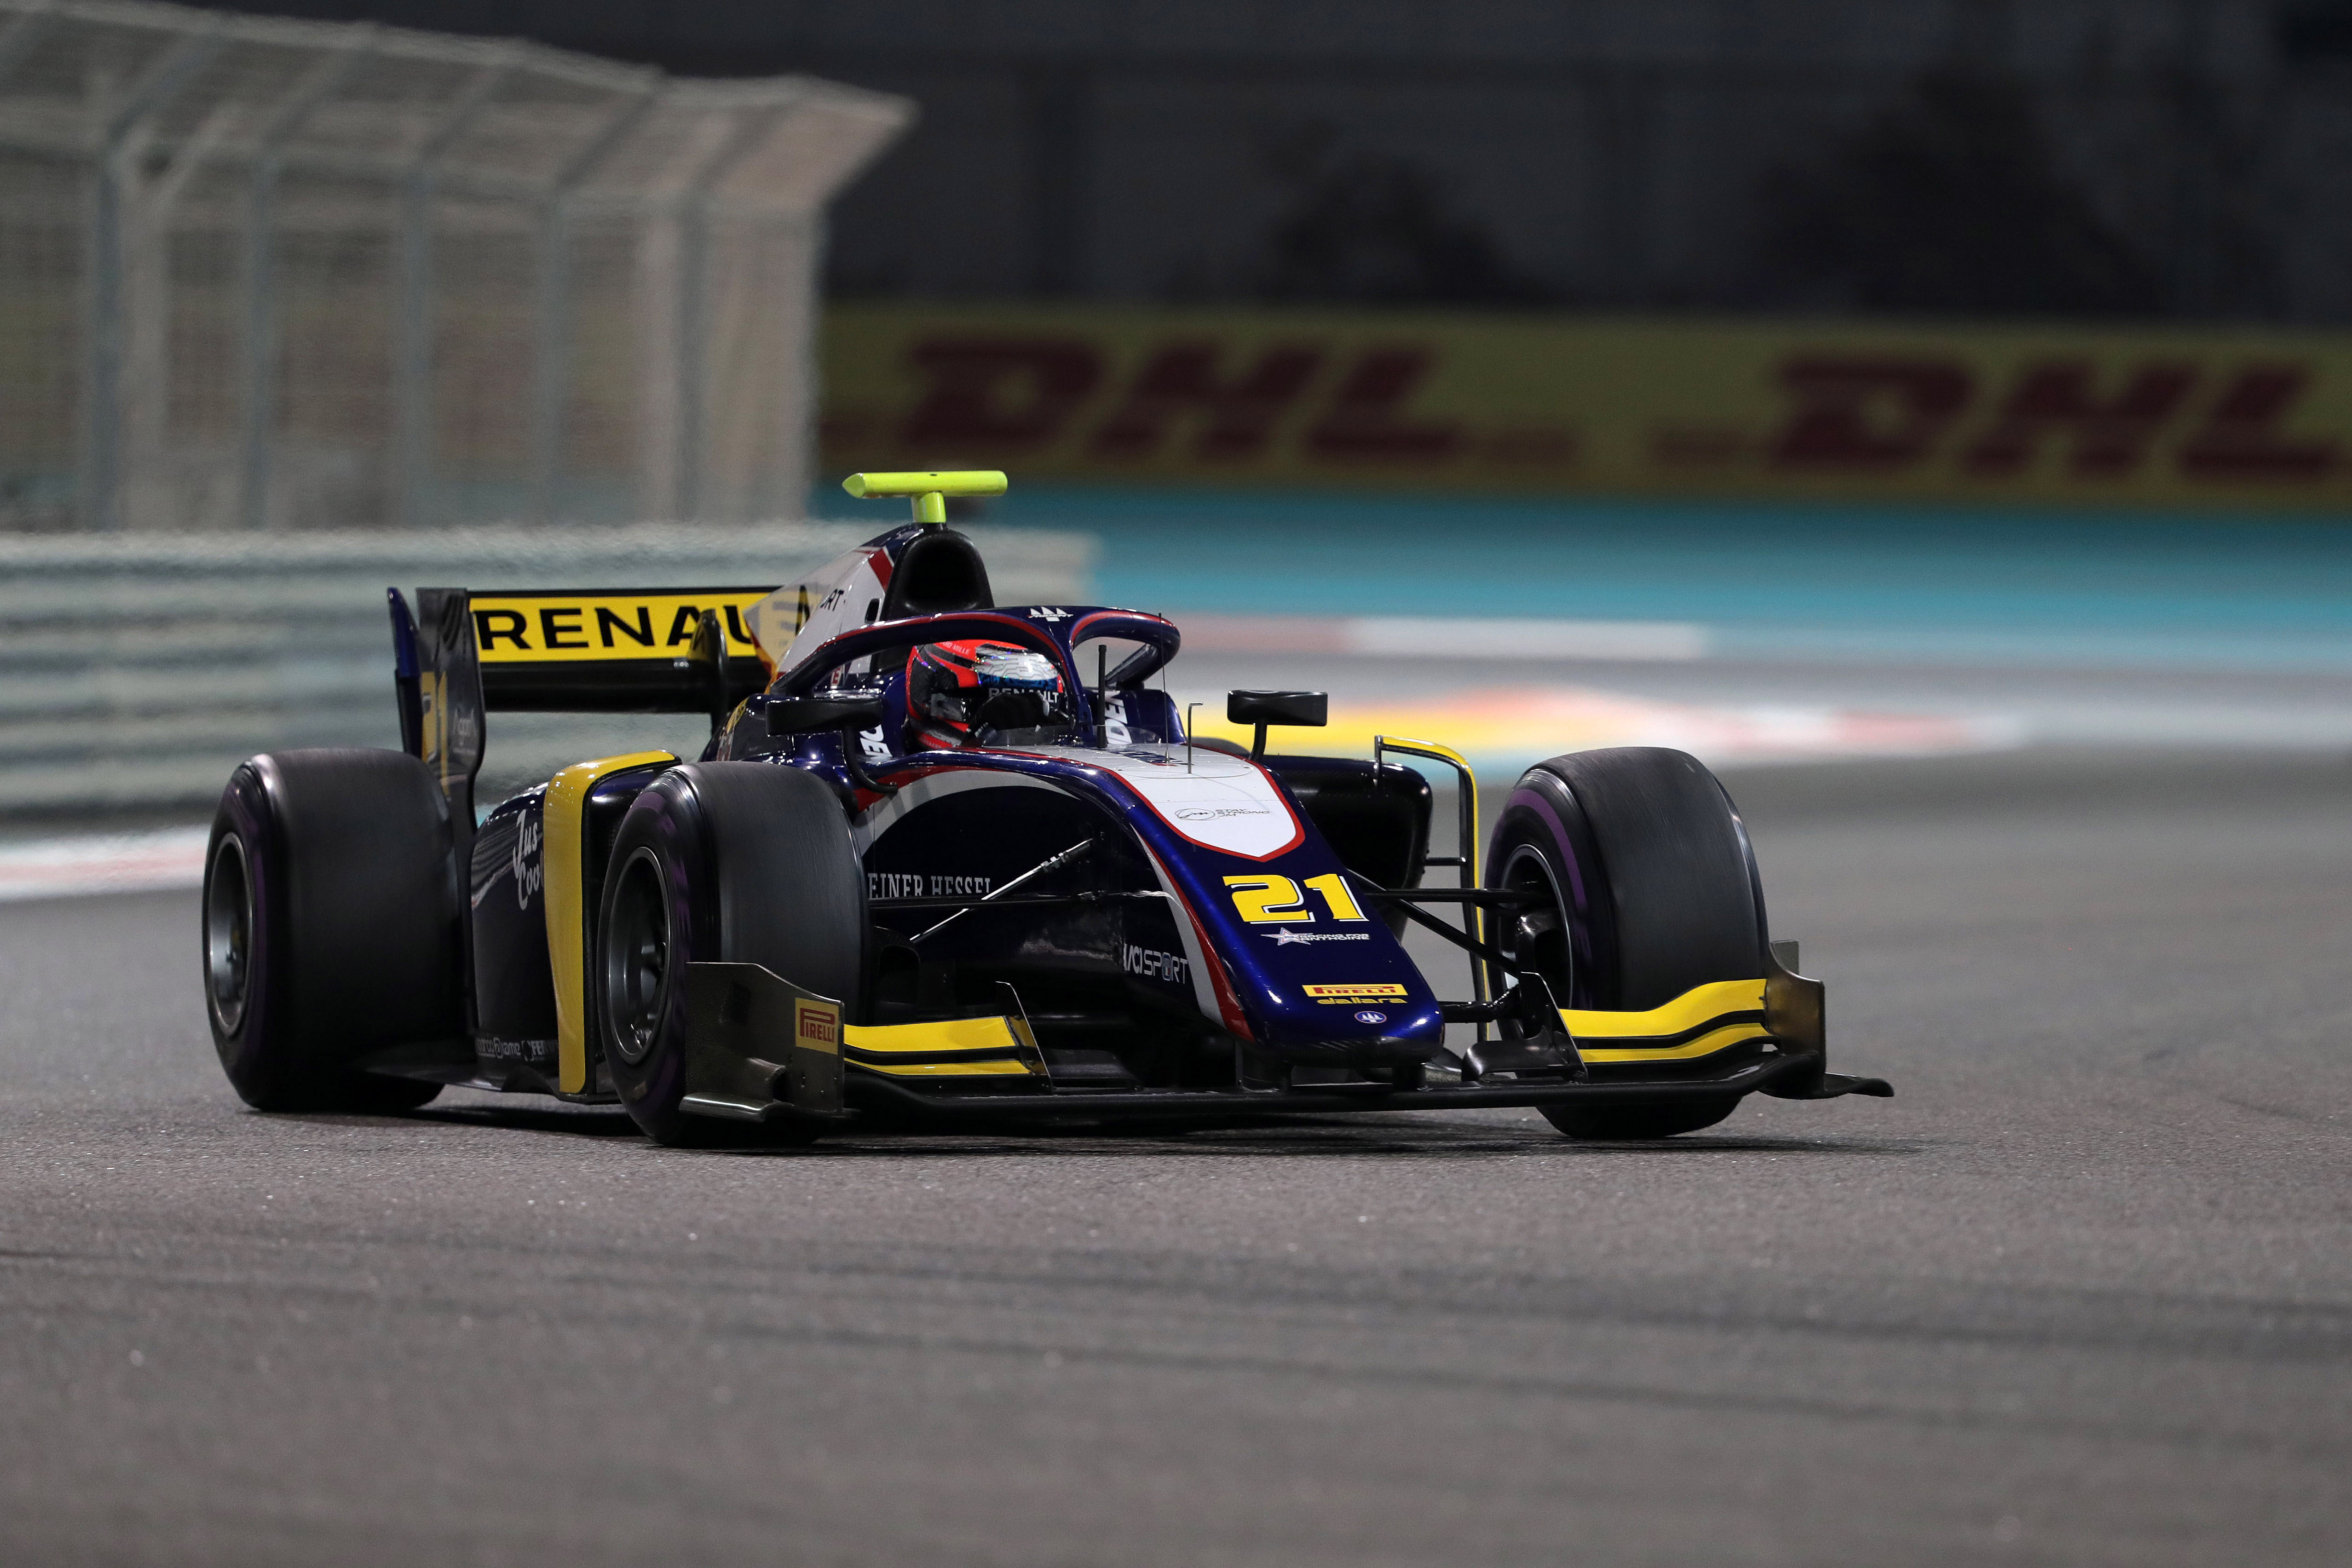 Motor Racing Fia Formula 2 Championship Friday Yas Marina Circuit, Abu Dhabi